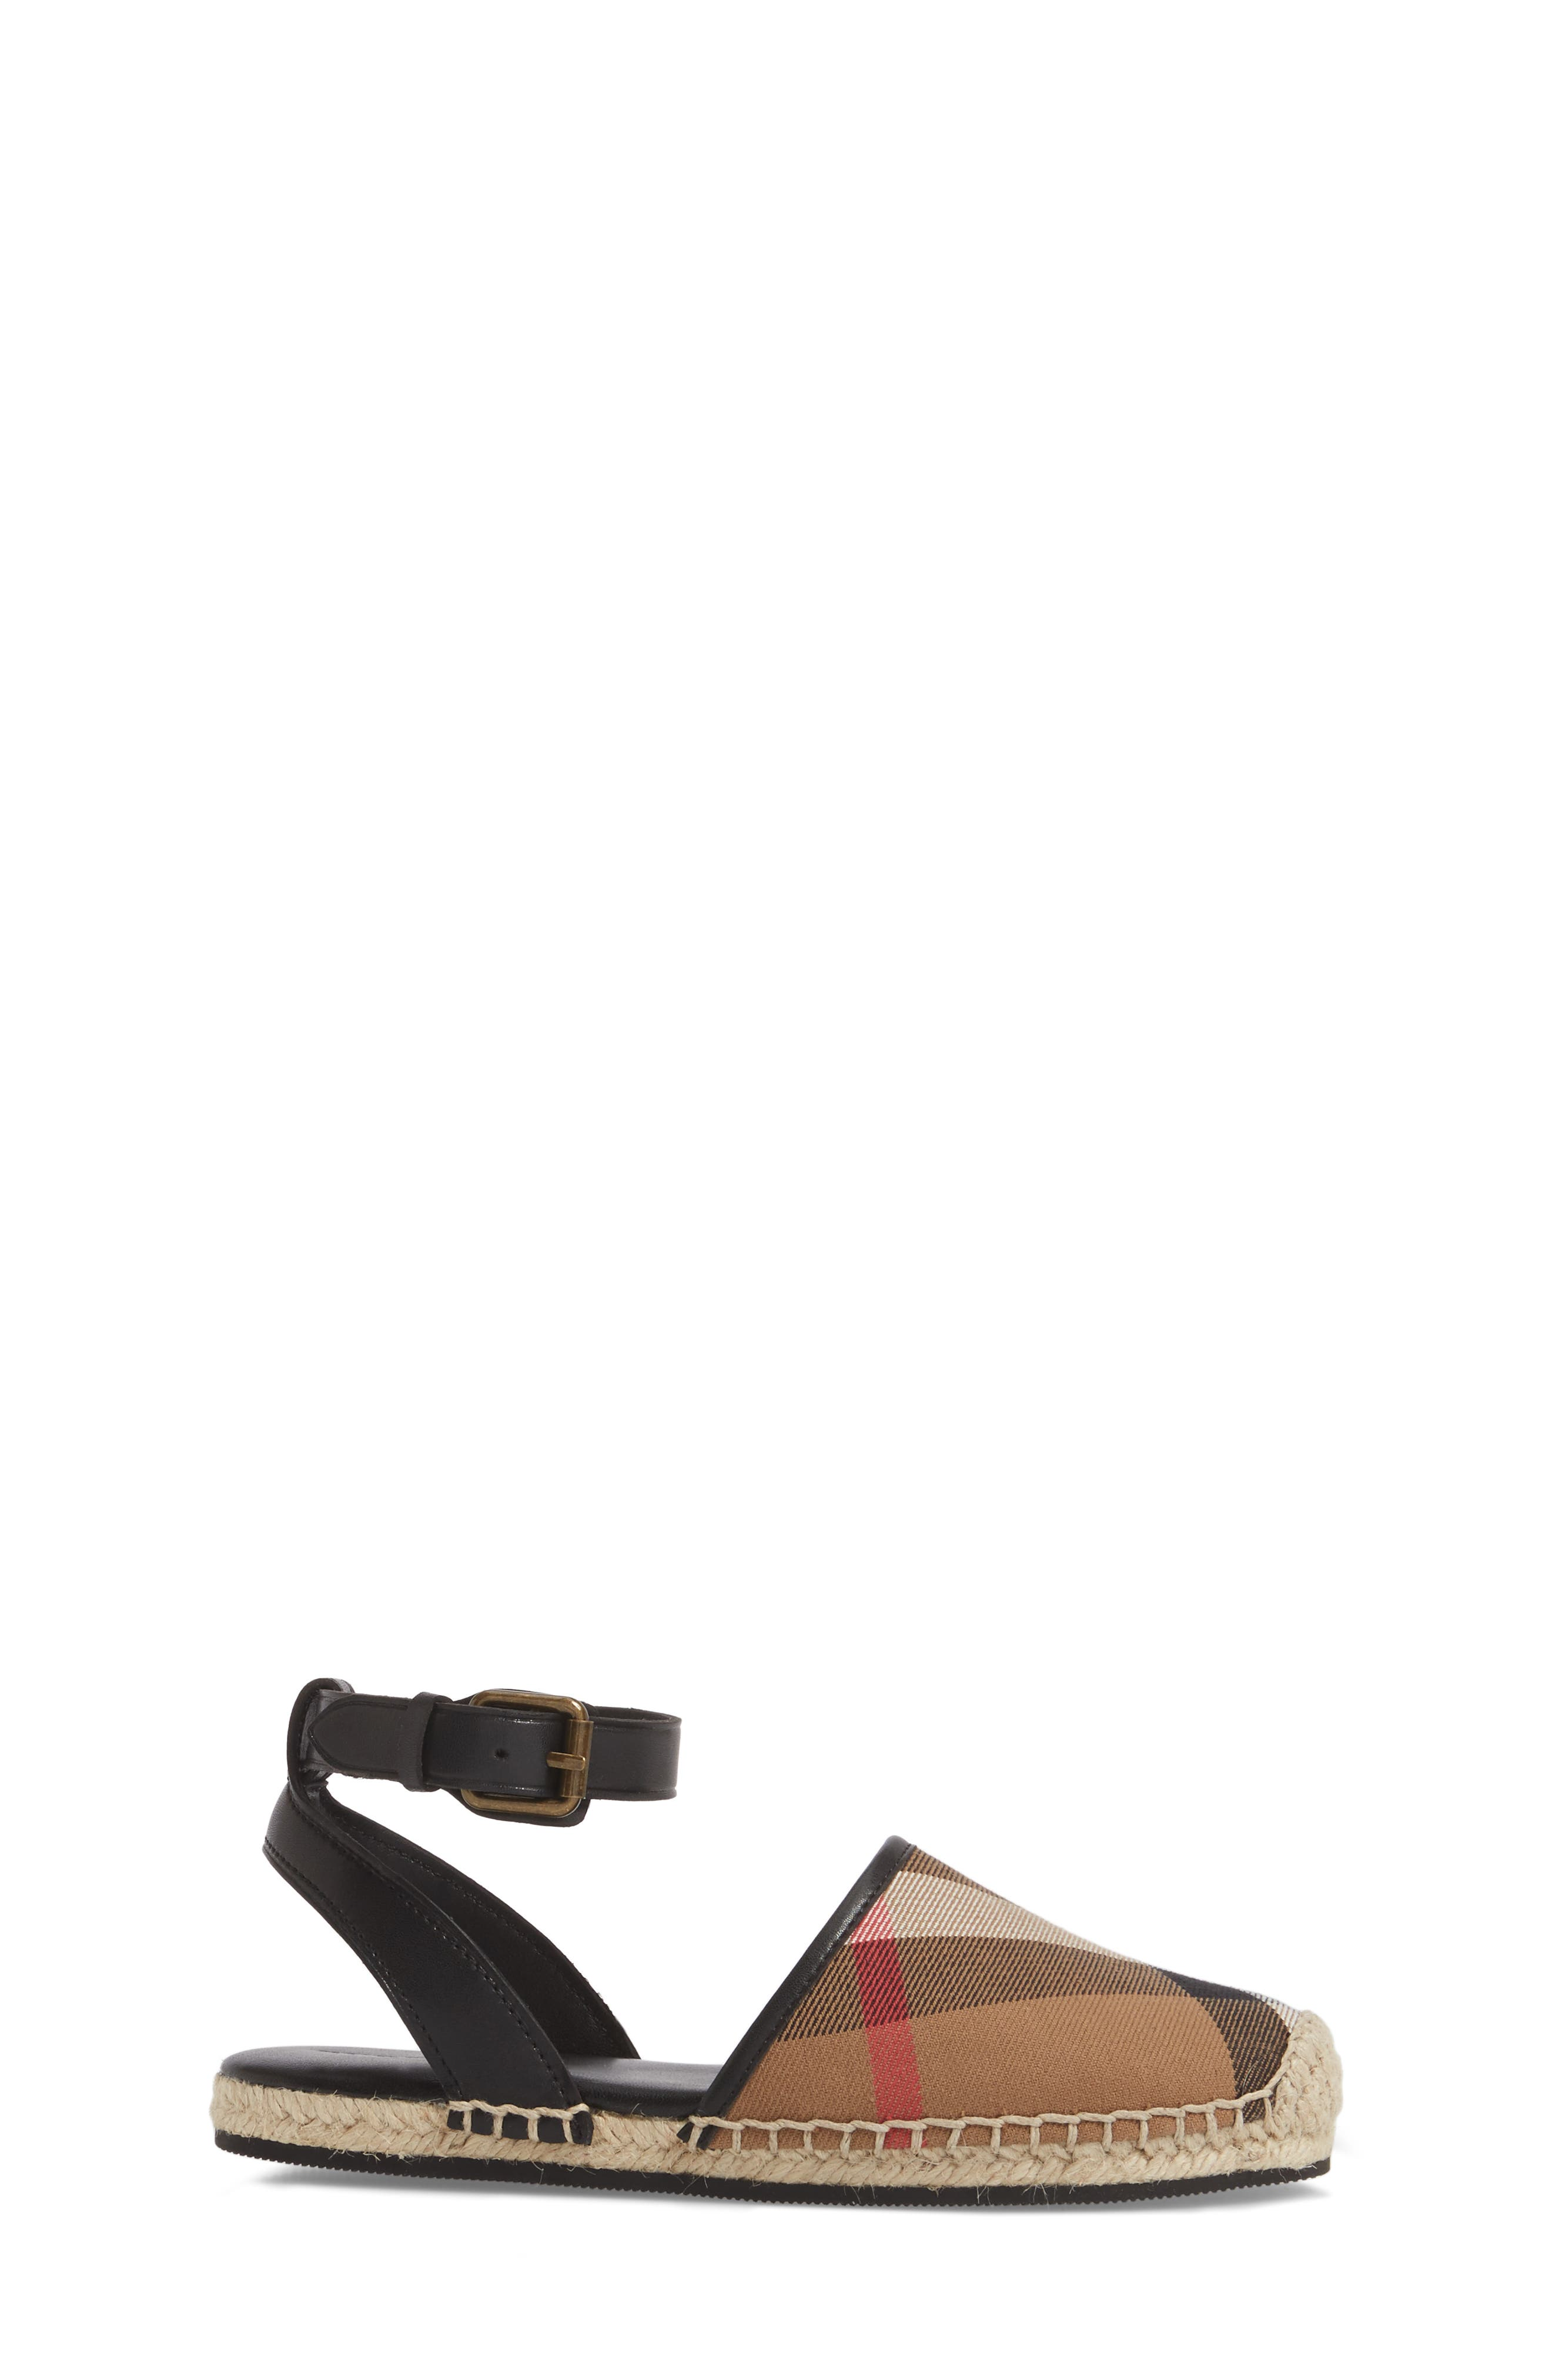 Perth Ankle Strap Sandal,                             Alternate thumbnail 3, color,                             BLACK